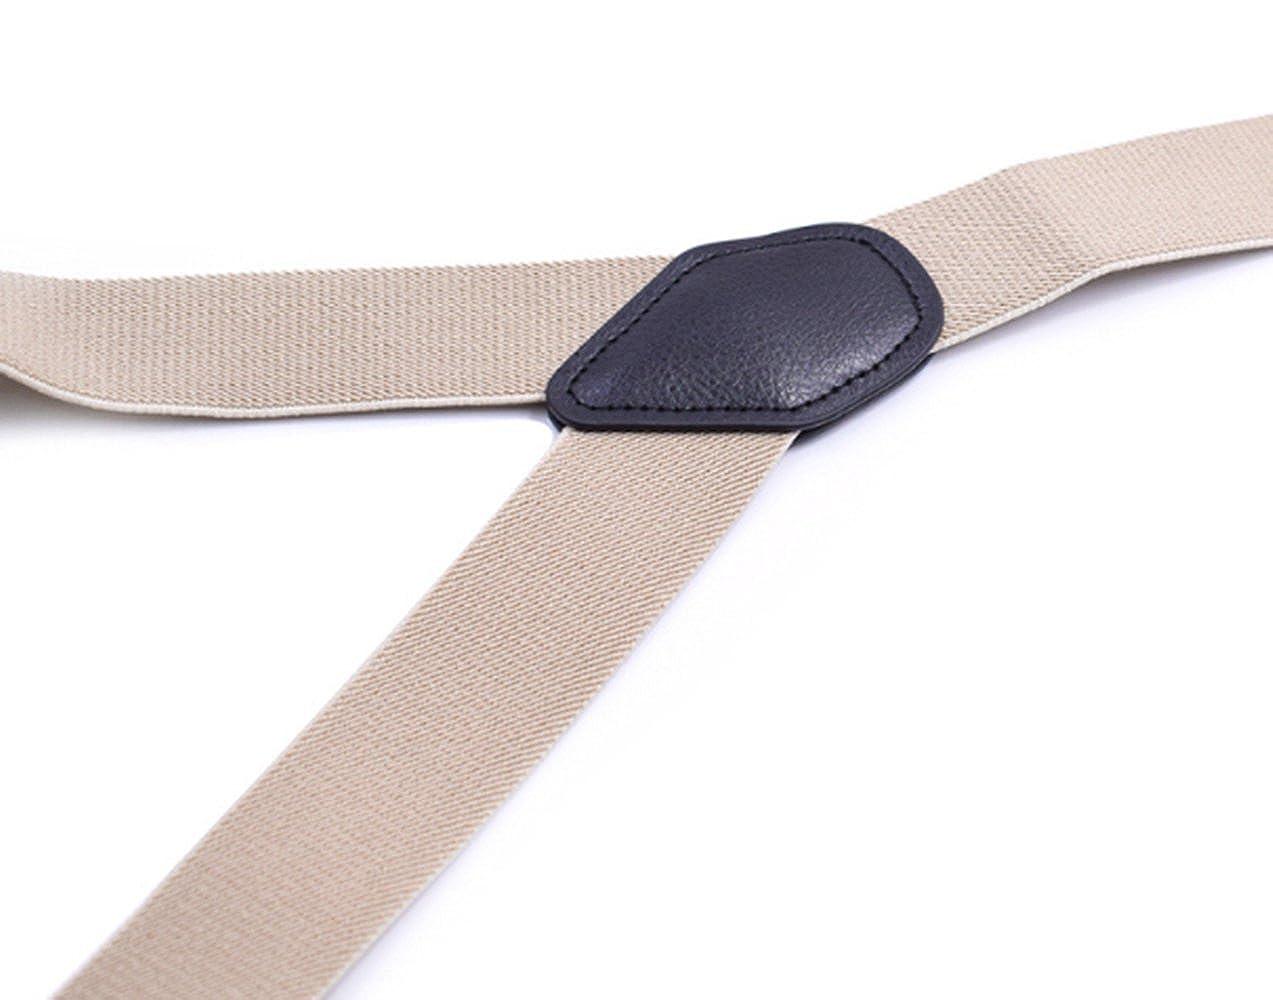 YUNEE Man Straps 6 Clips Leather Trousers Jeans Y Elastic Shape Fit Brace